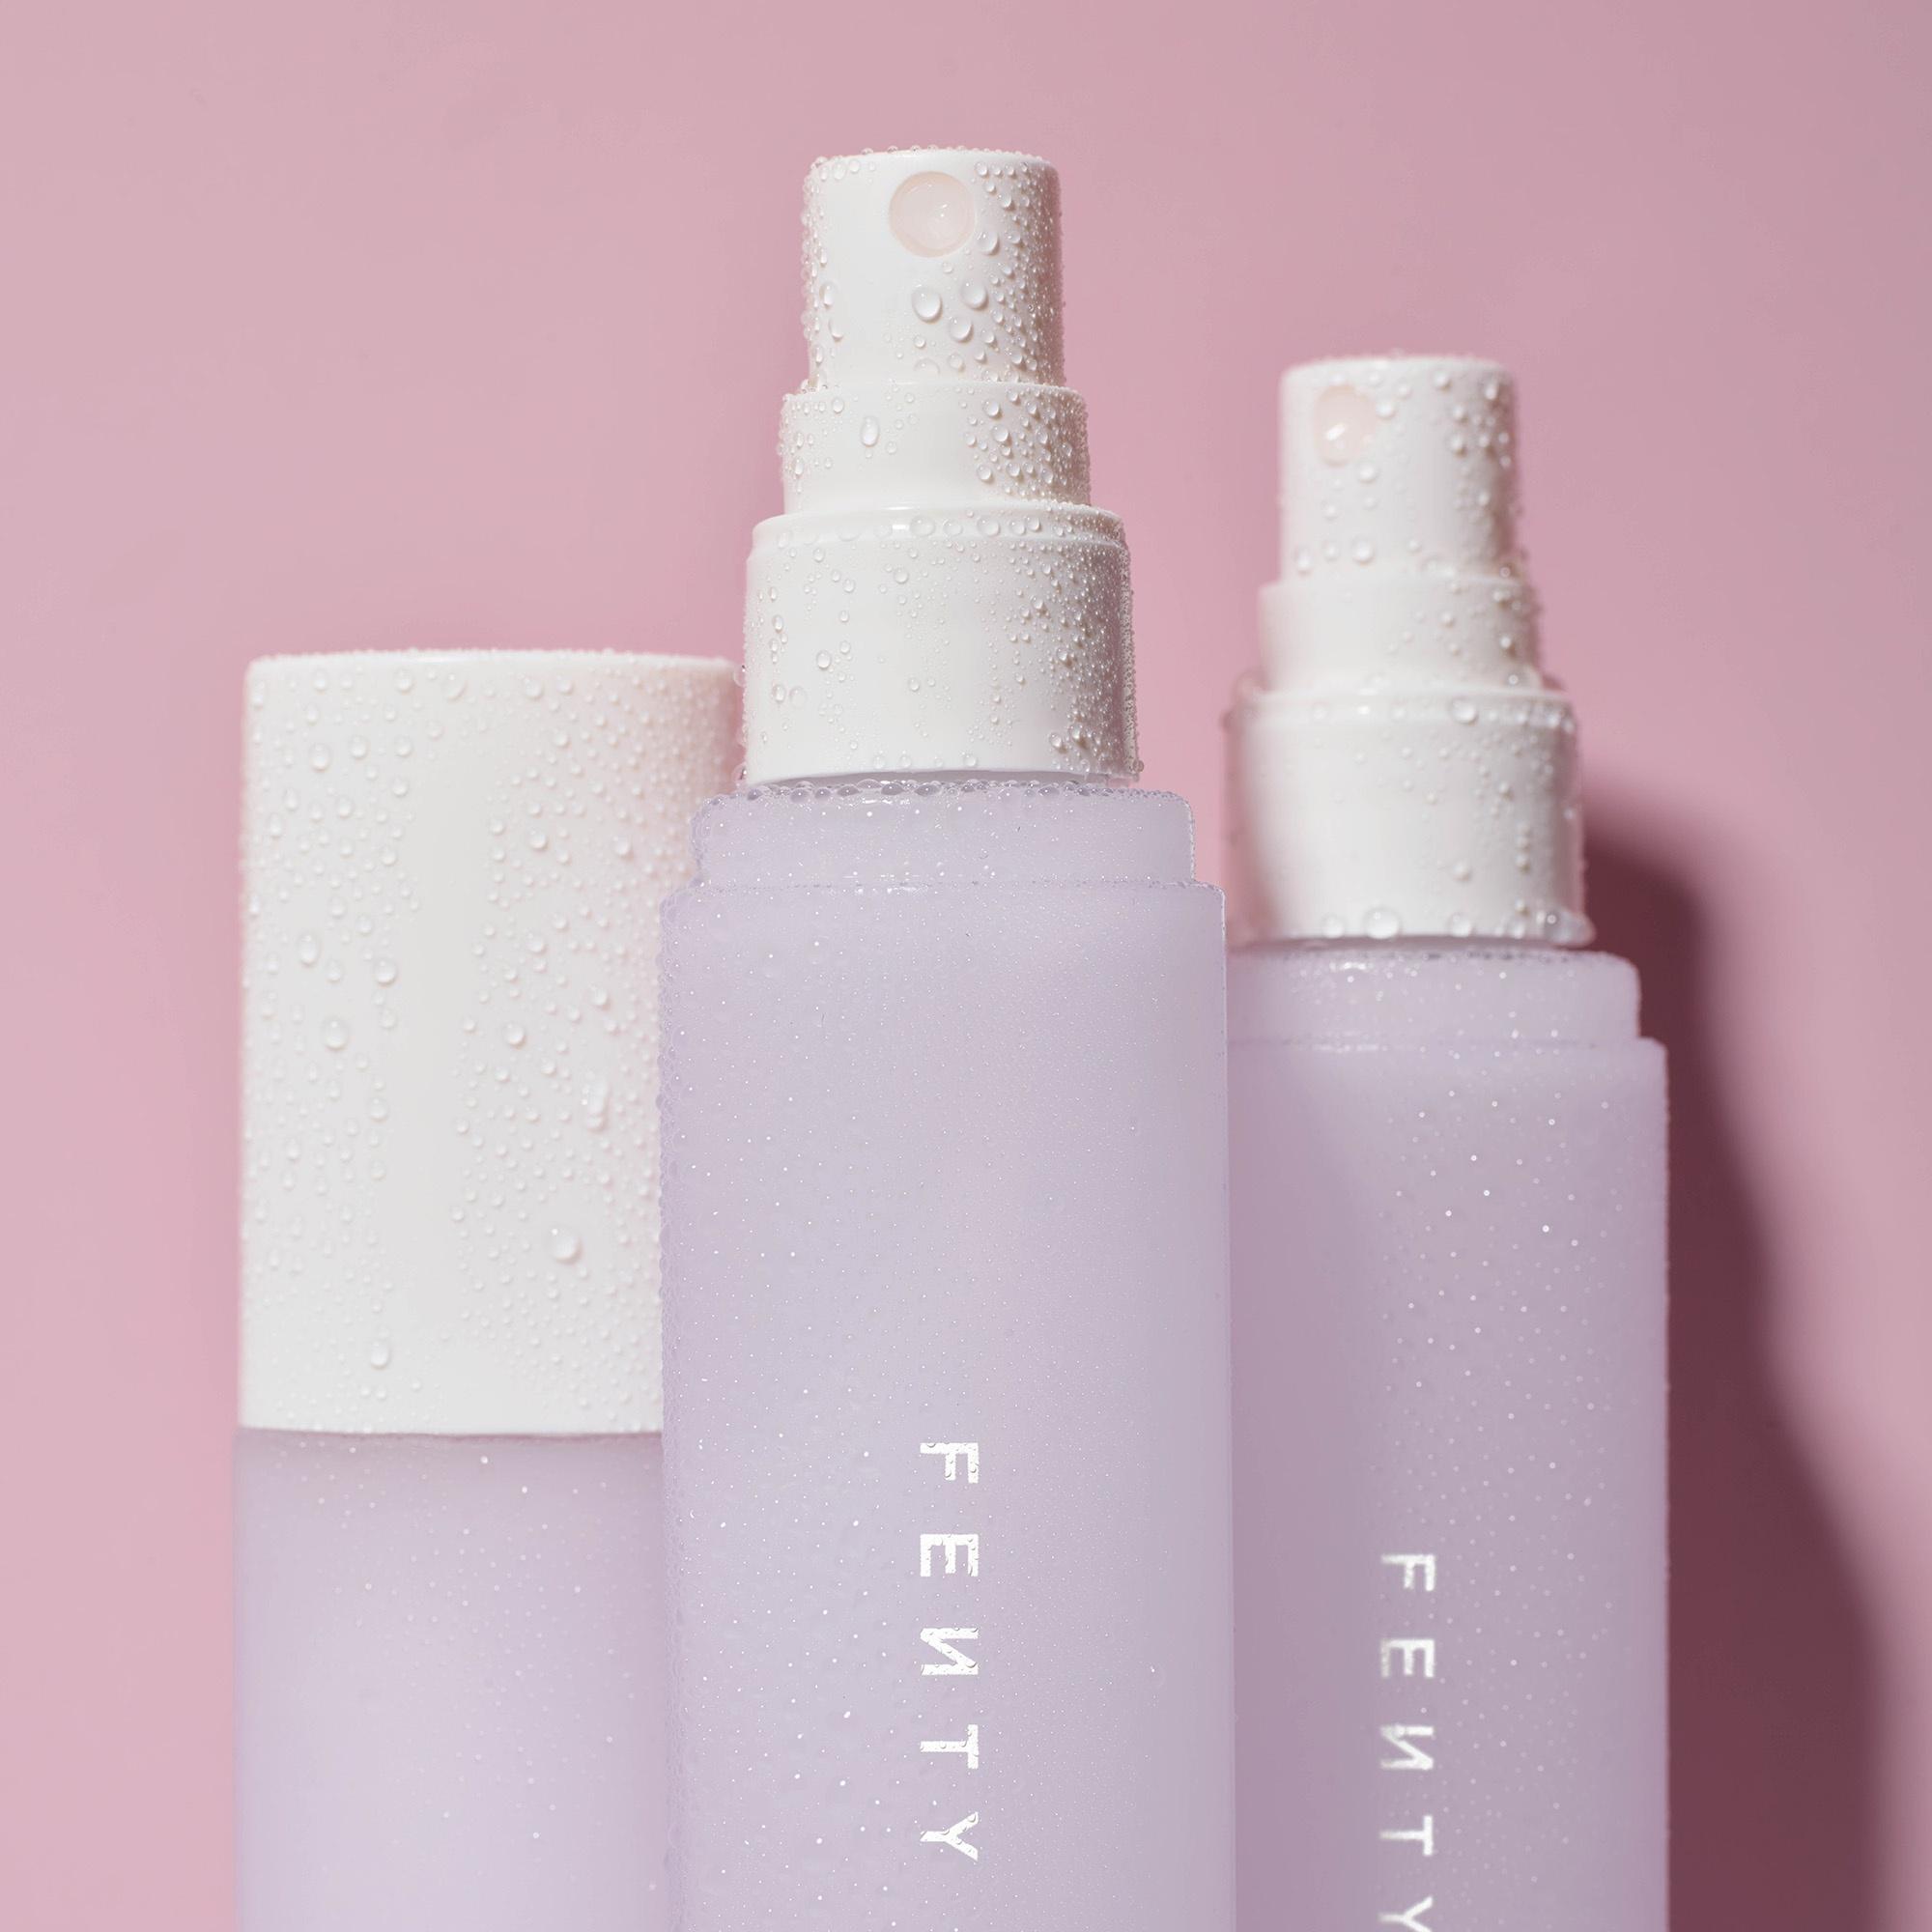 Fenty Beauty推出彩妆喷雾与全新流光唇釉